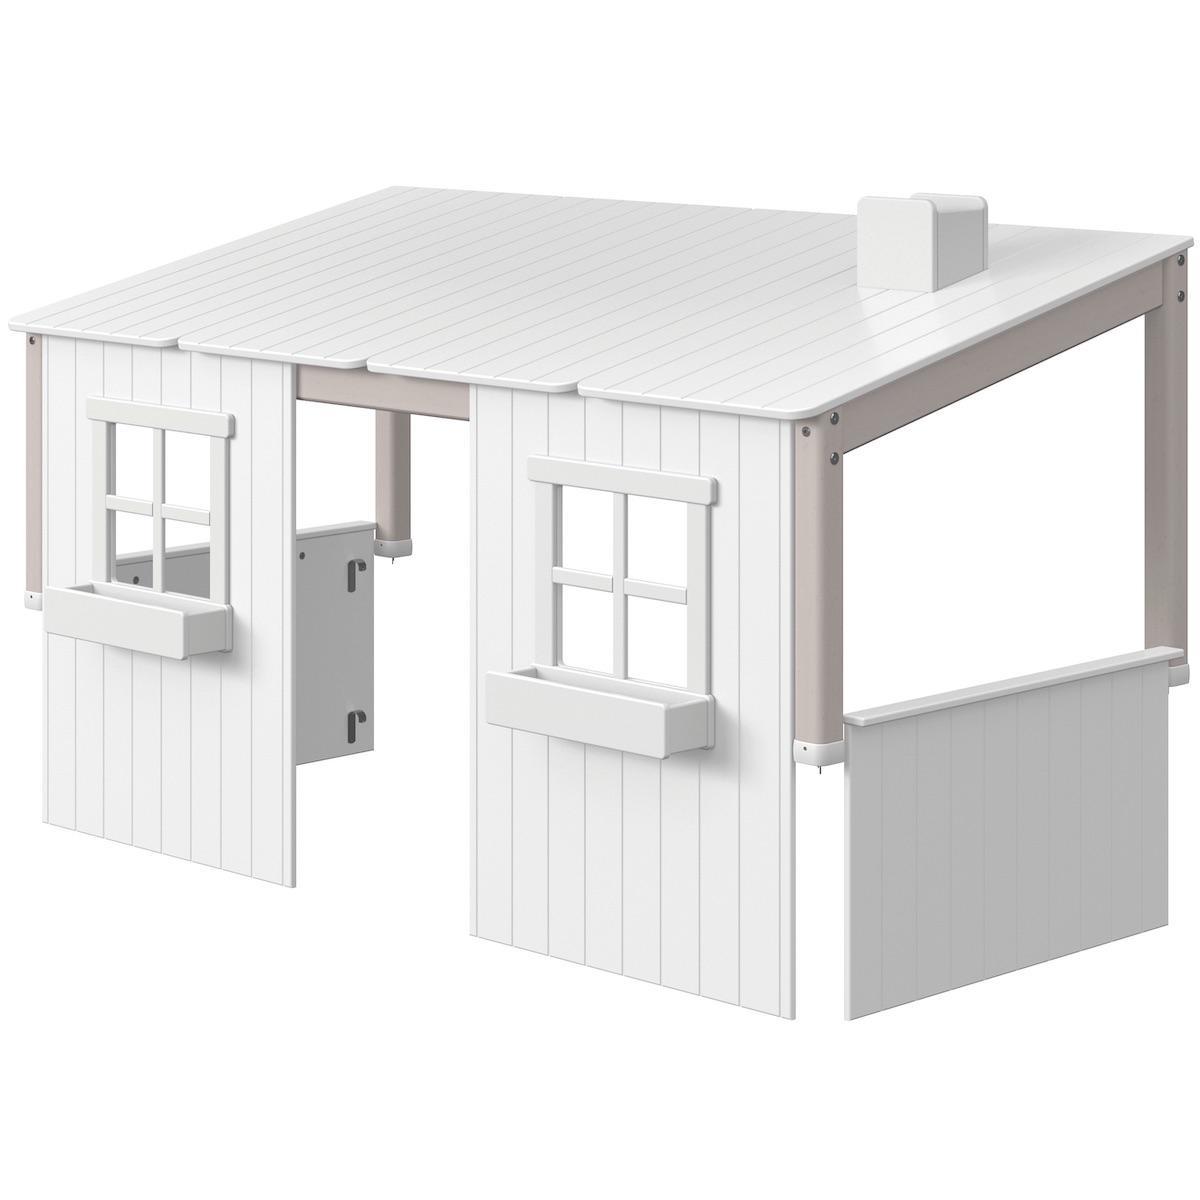 Structure toit lit cabane 200cm 1/1 PLAY HOUSE CLASSIC Flexa grey wash